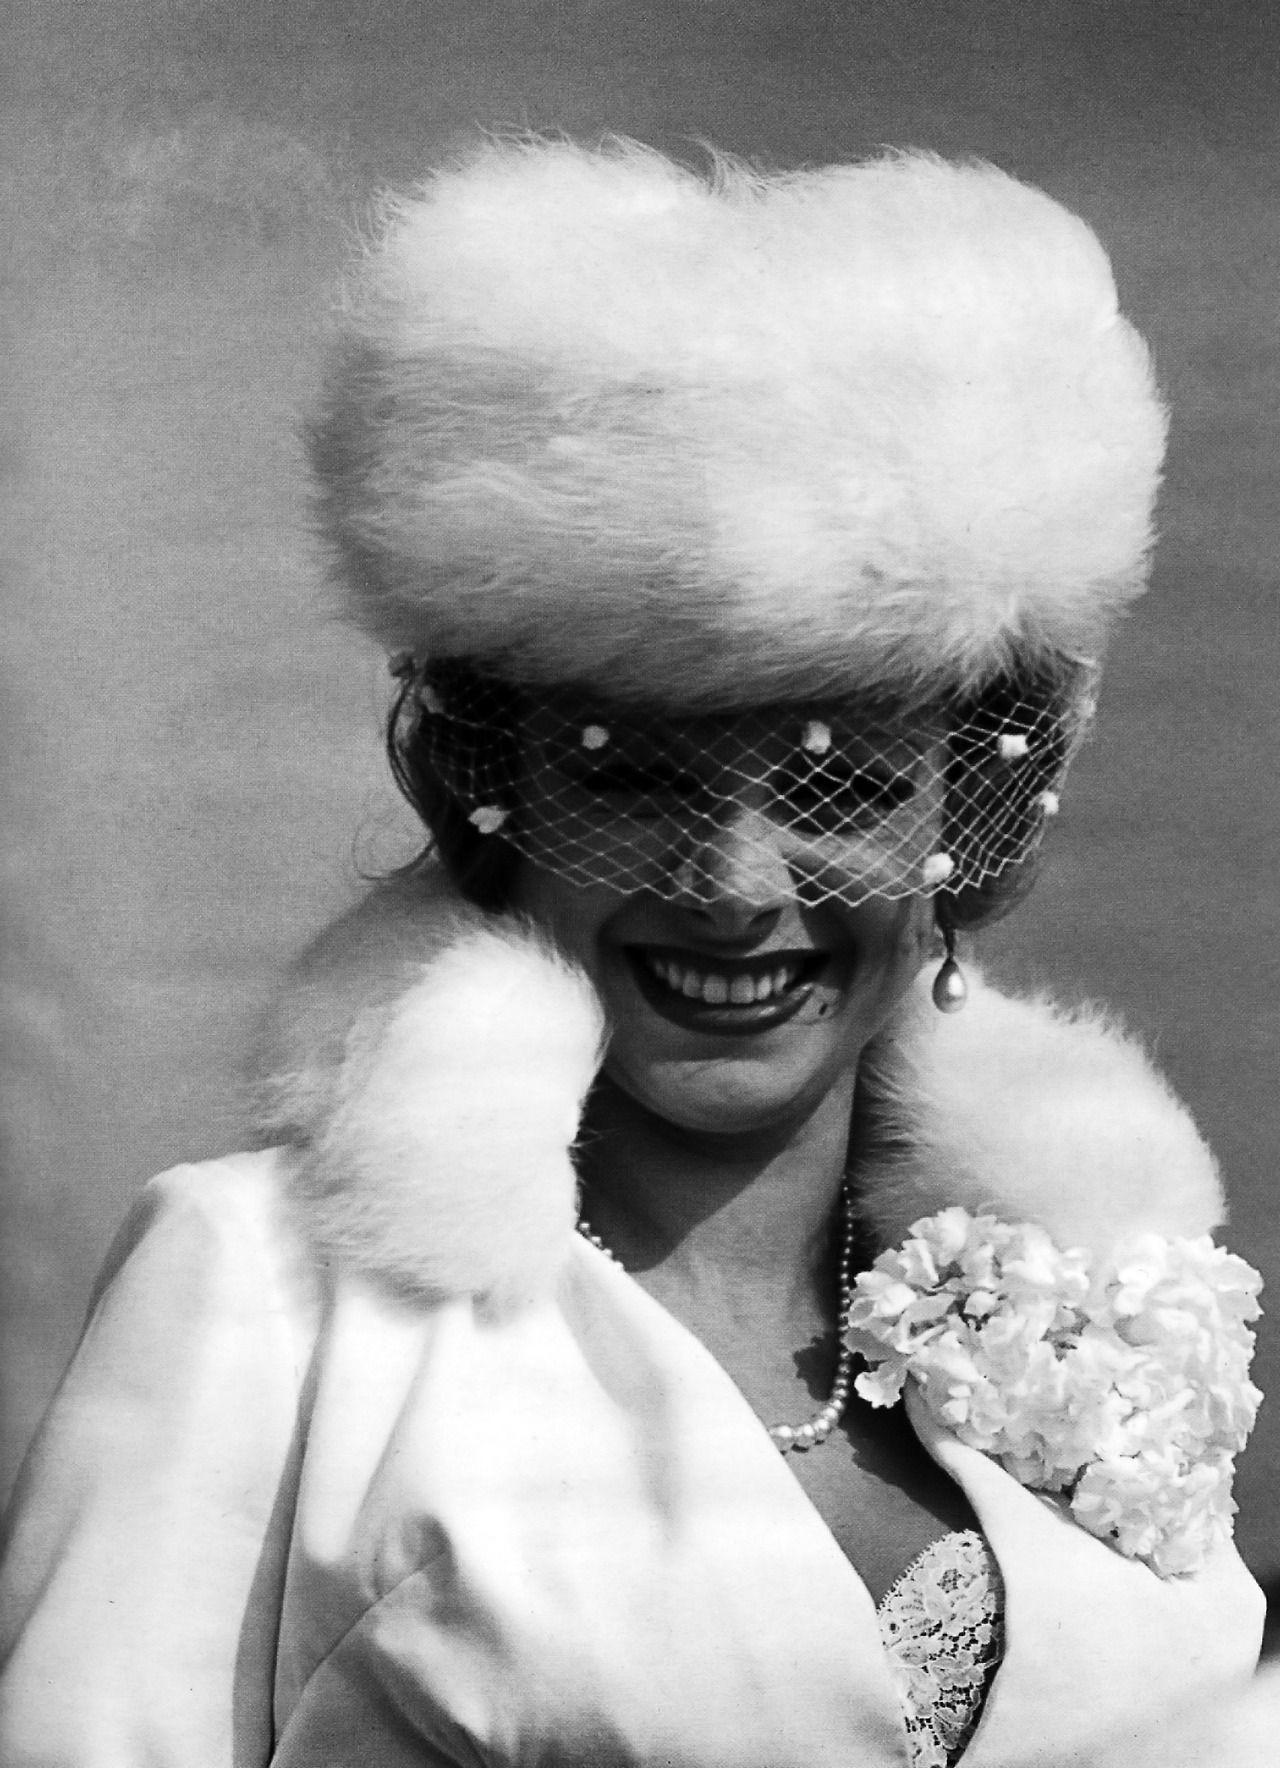 Forum on this topic: Jessica Stroup, sandra-milo-born-1935/